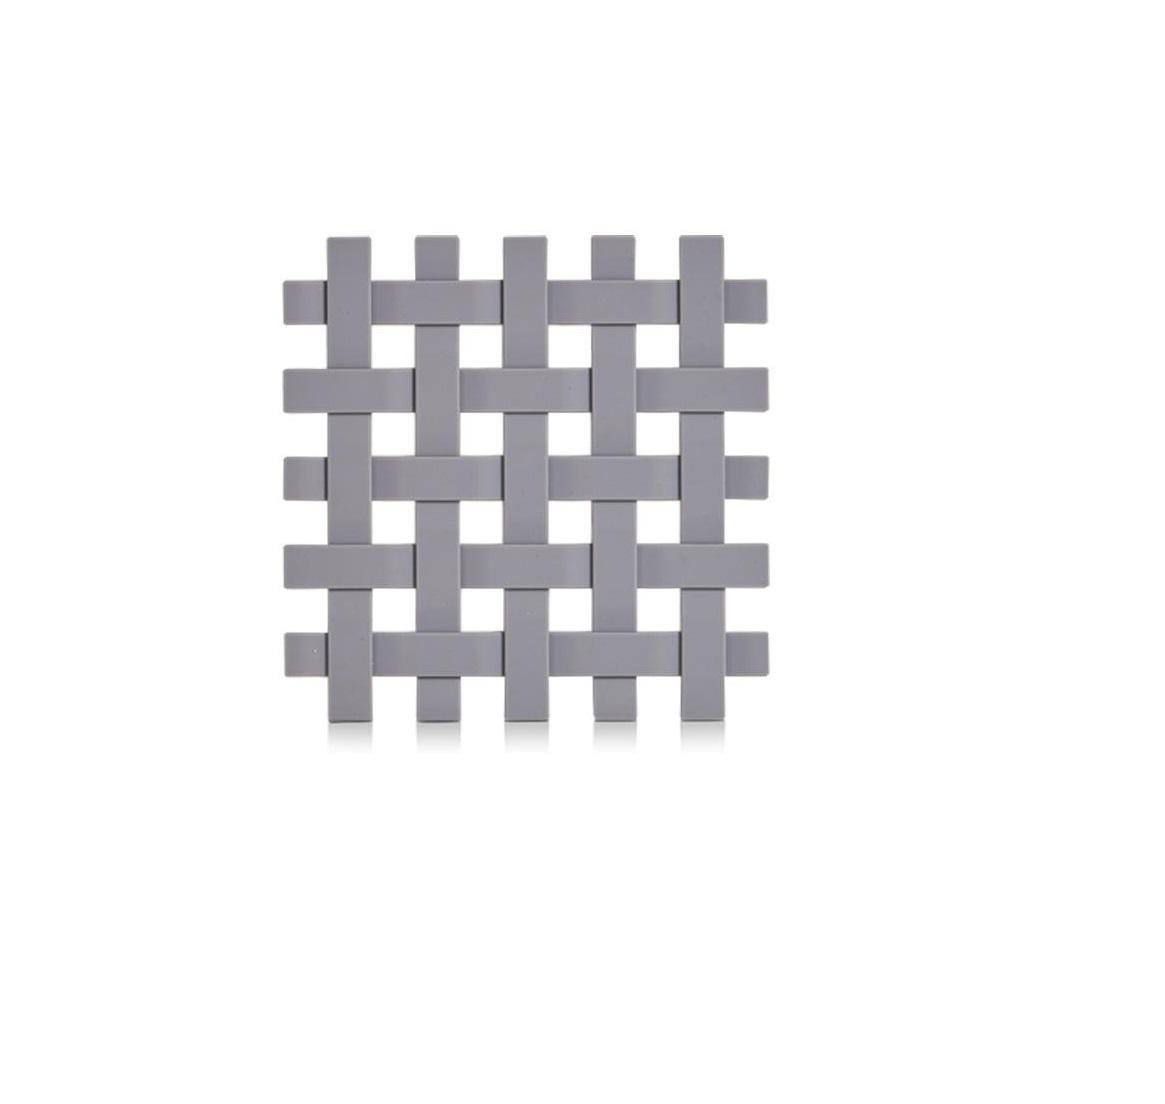 Suport pentru vesela, din plastic Trivet Gri, L17,2xl17,2 cm imagine 2021